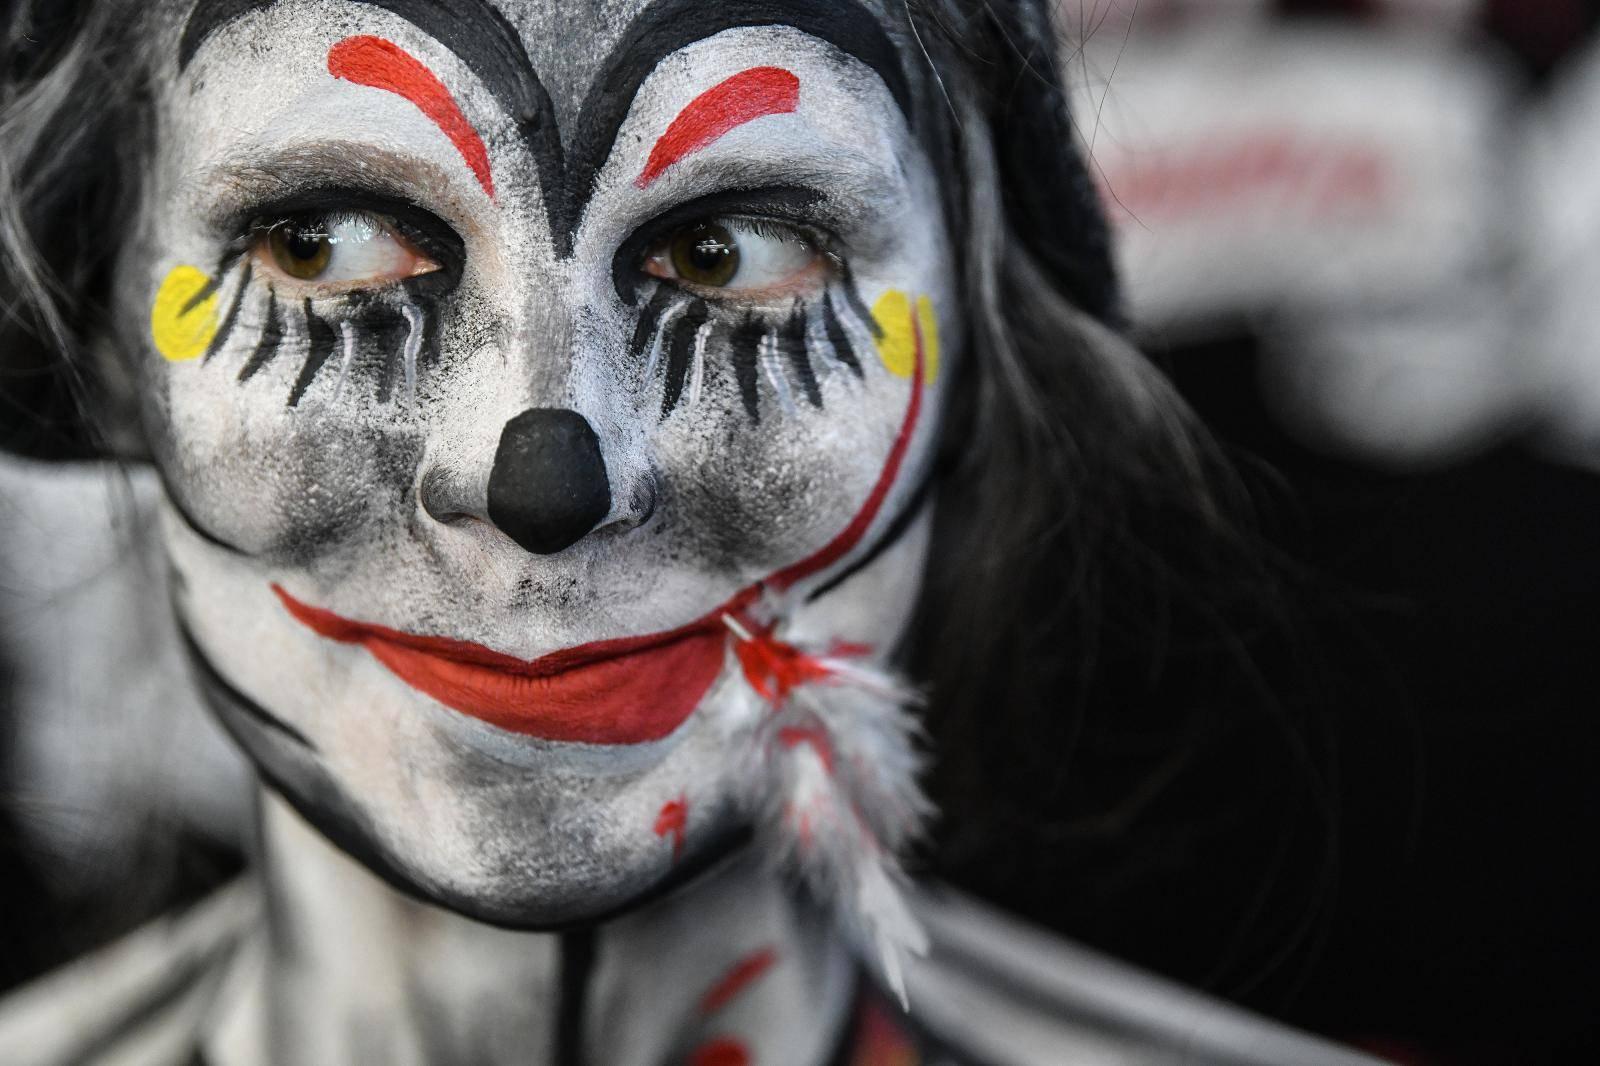 Zagreb: Prvenstvo Hrvatske u bodypaintingu održano u sklopu Beauty & Hair Expo